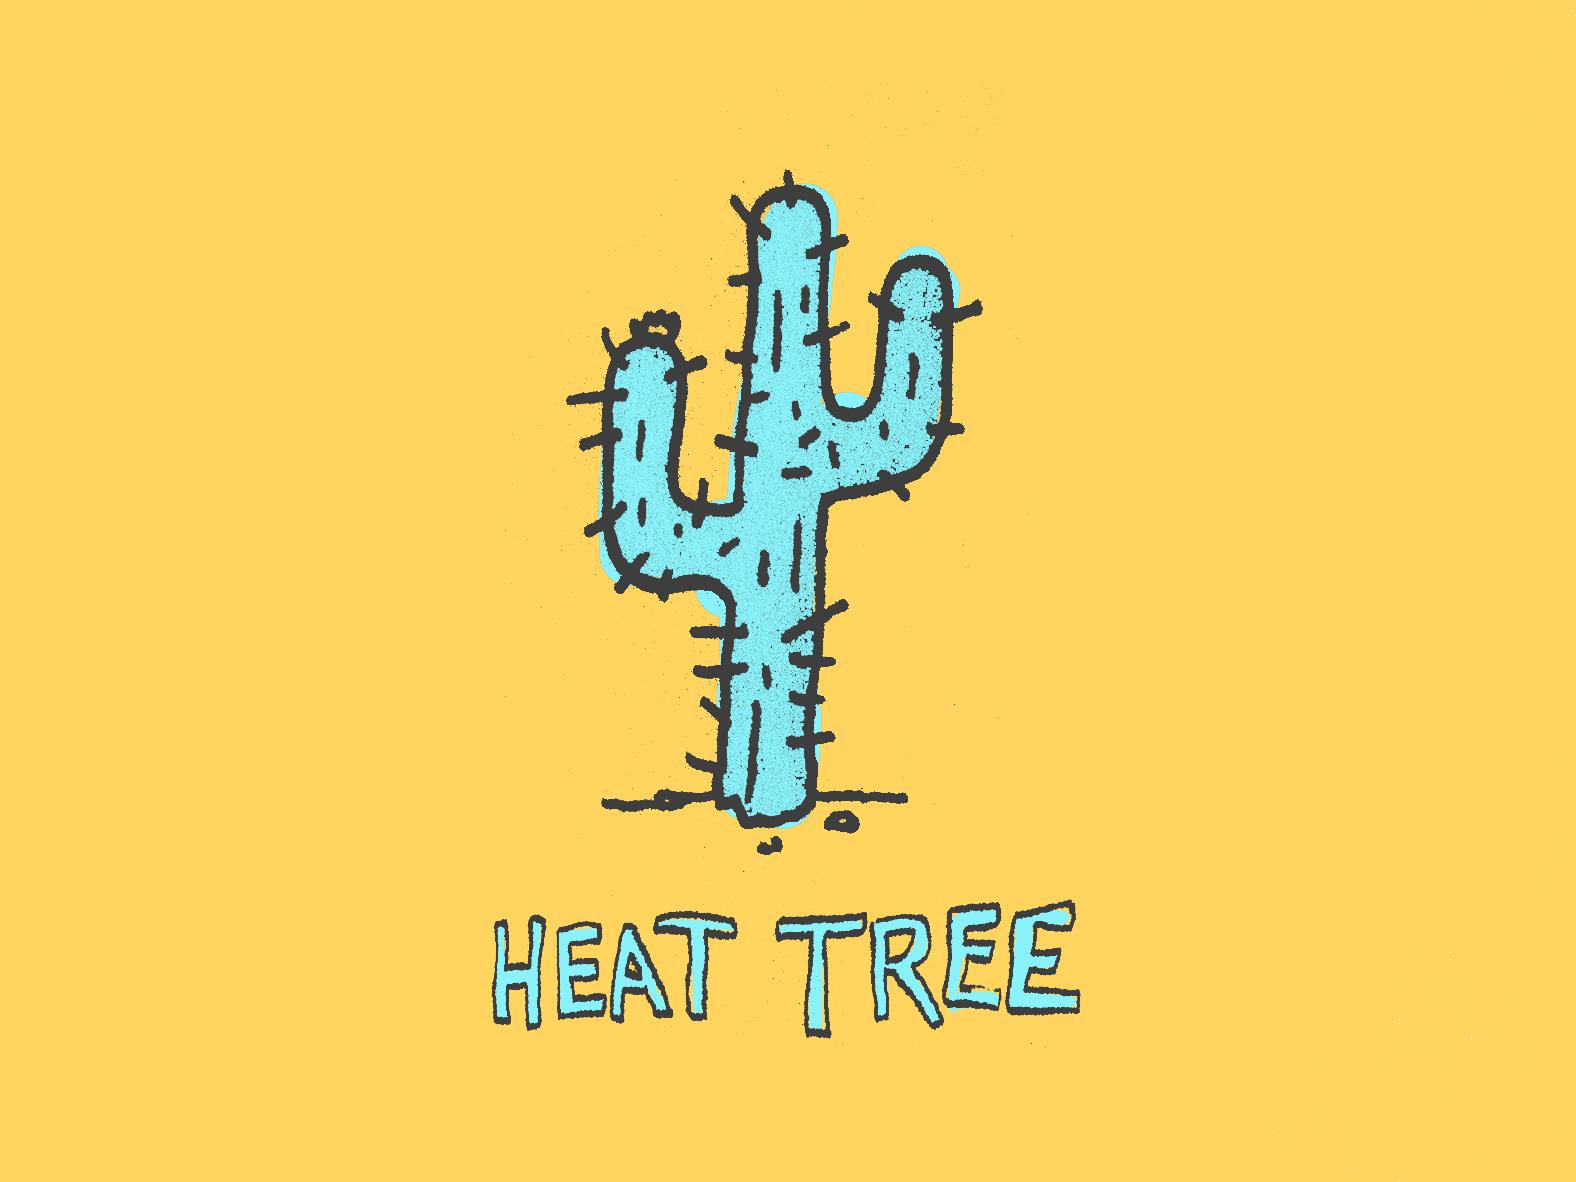 Heat Tree